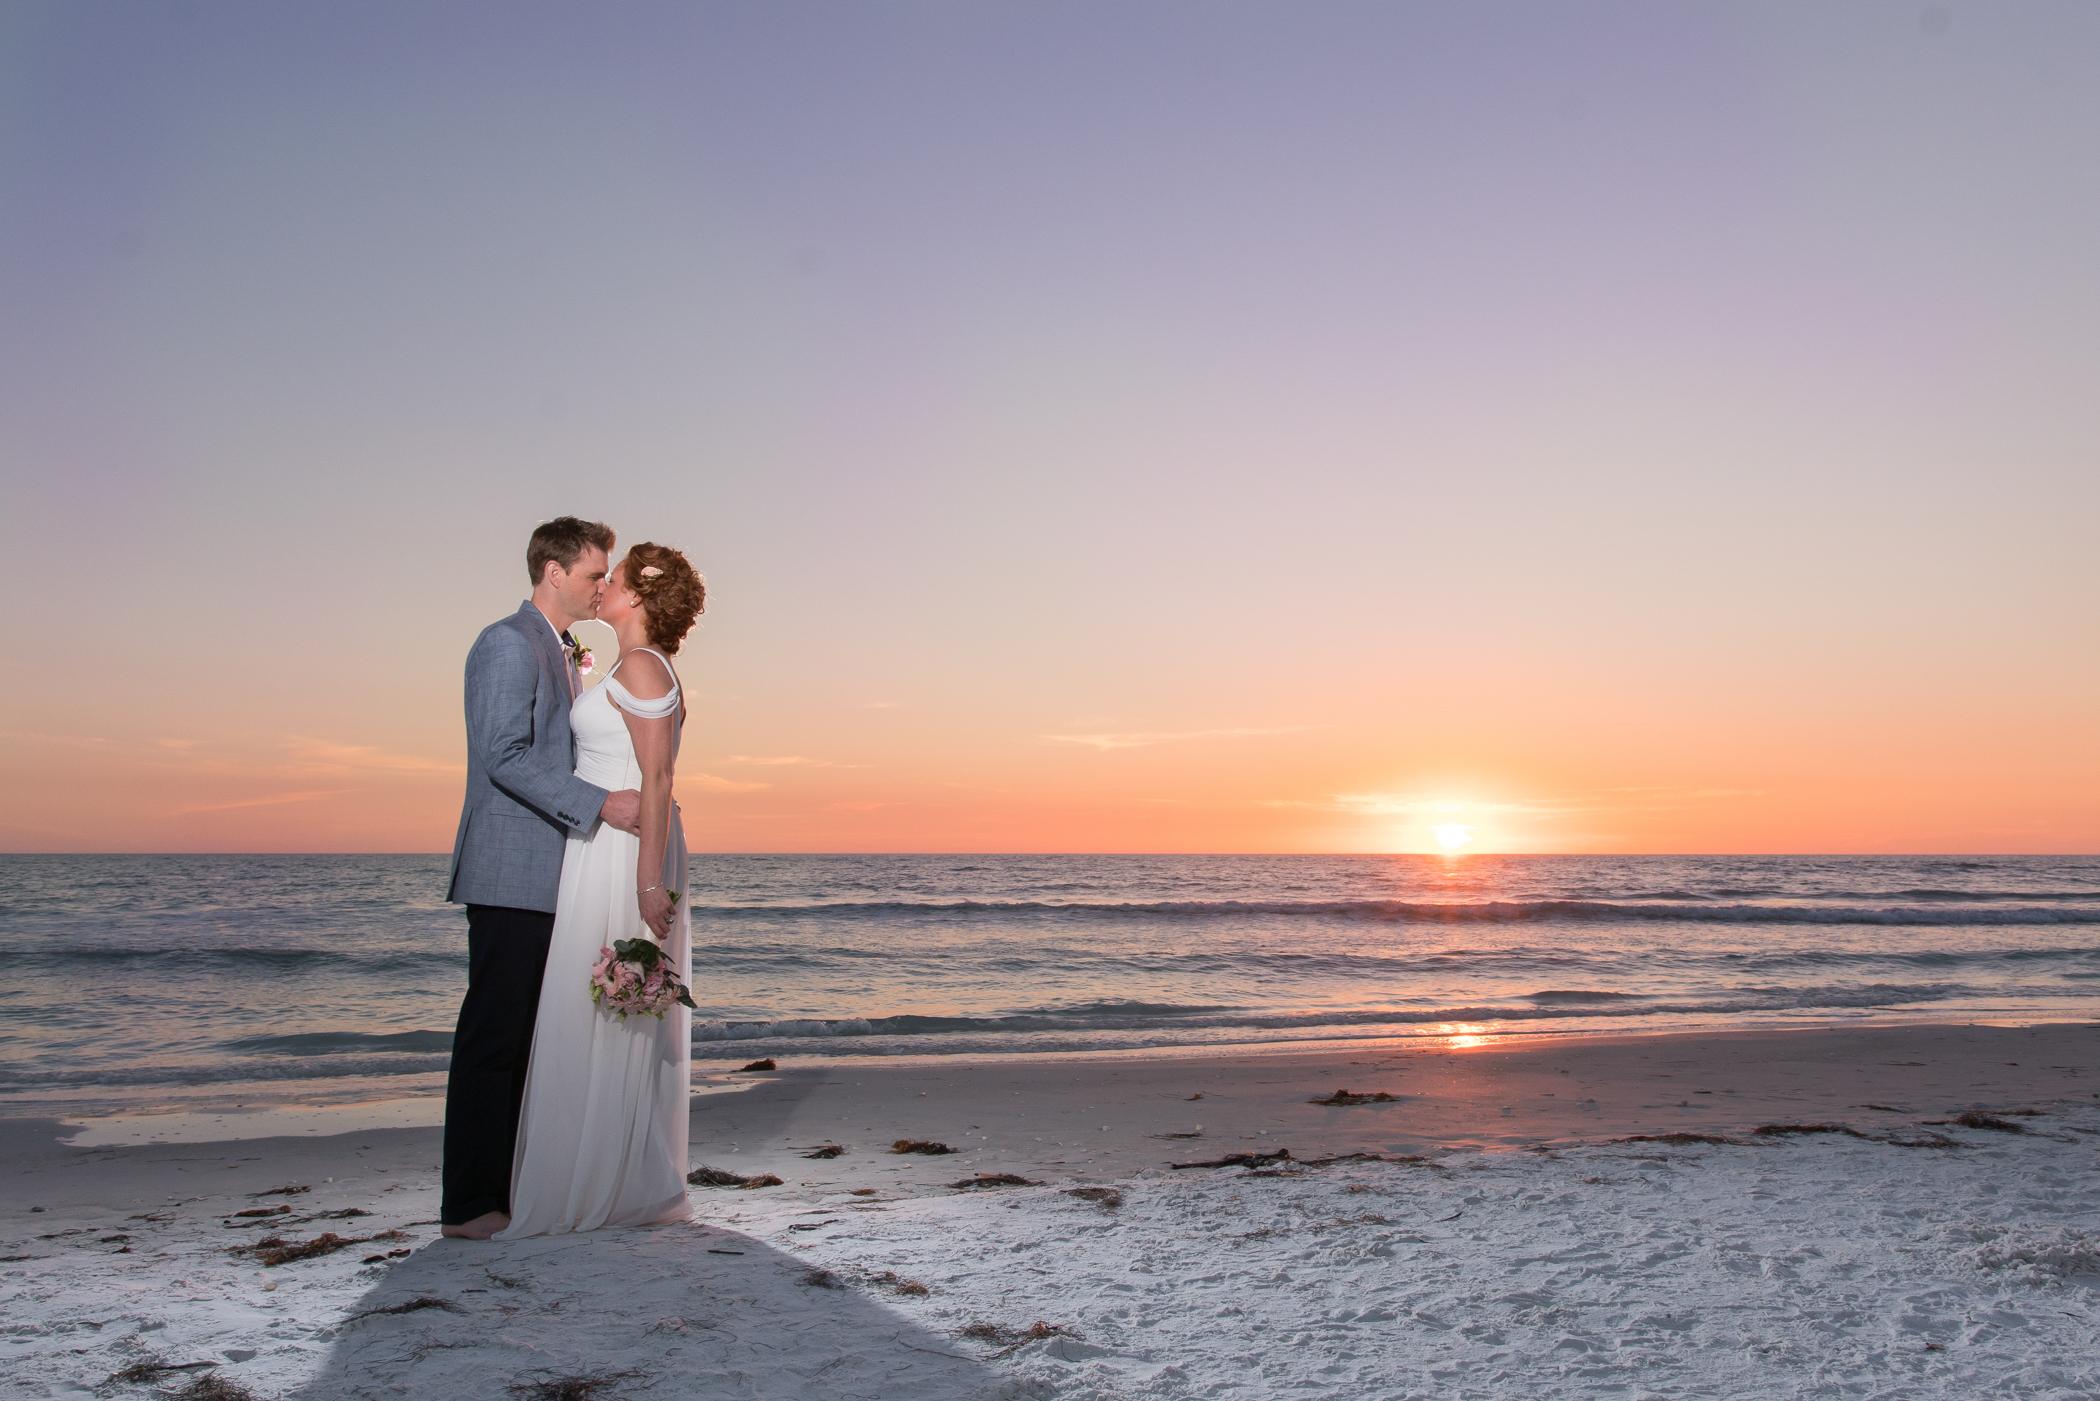 Sarasota-beach-wedding-photo, Lido-key-sunset-photo